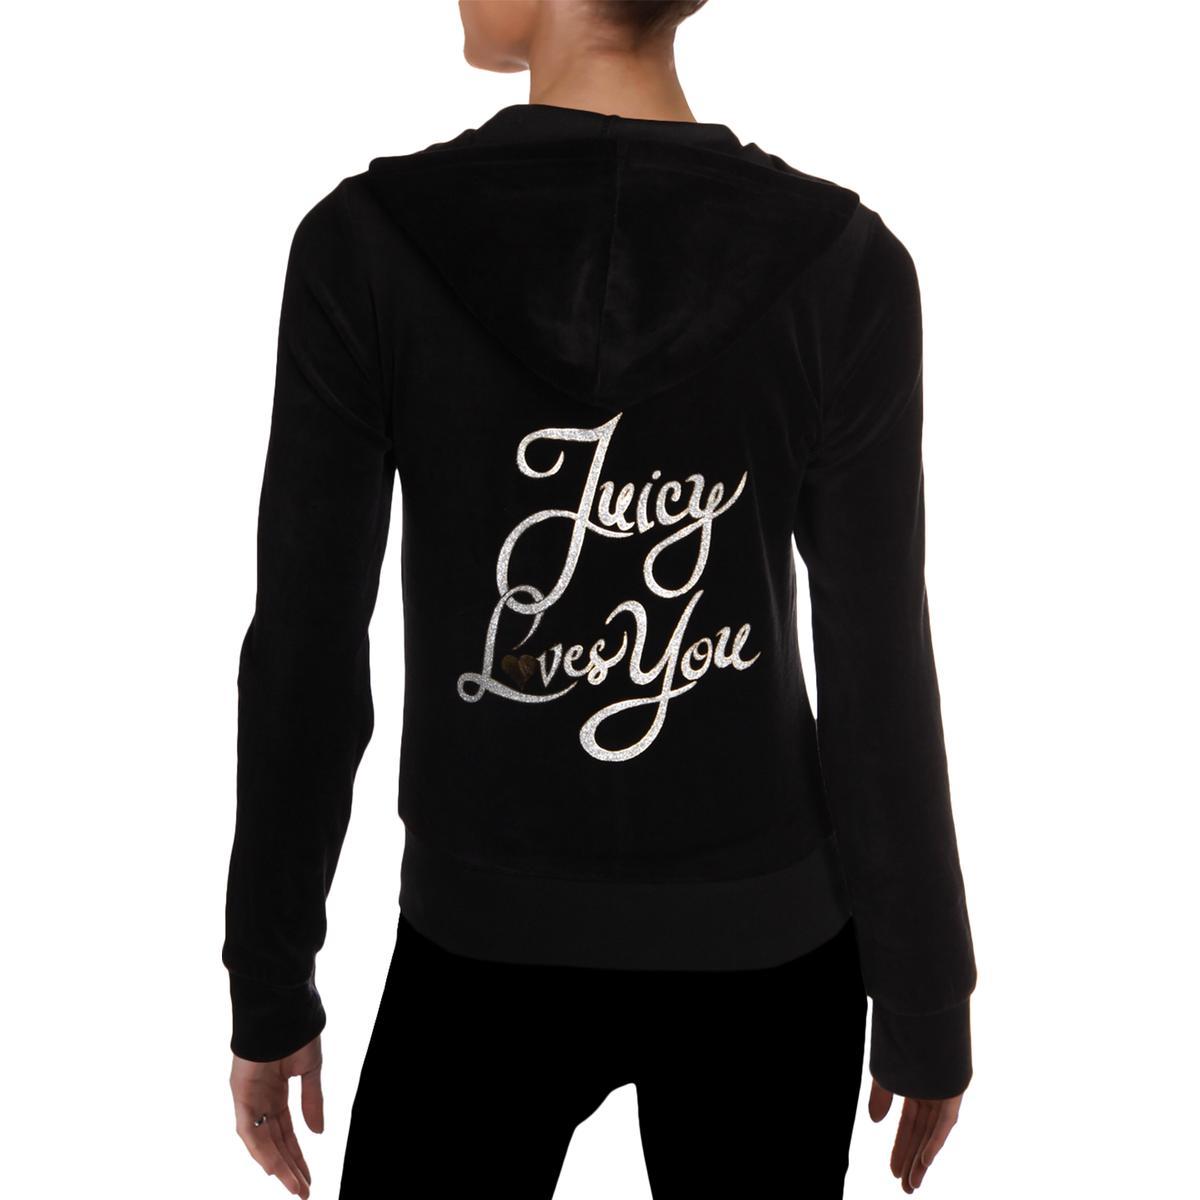 Juicy-Couture-Black-Label-Womens-Love-Robertson-Velour-Track-Jacket-BHFO-5236 miniatuur 4